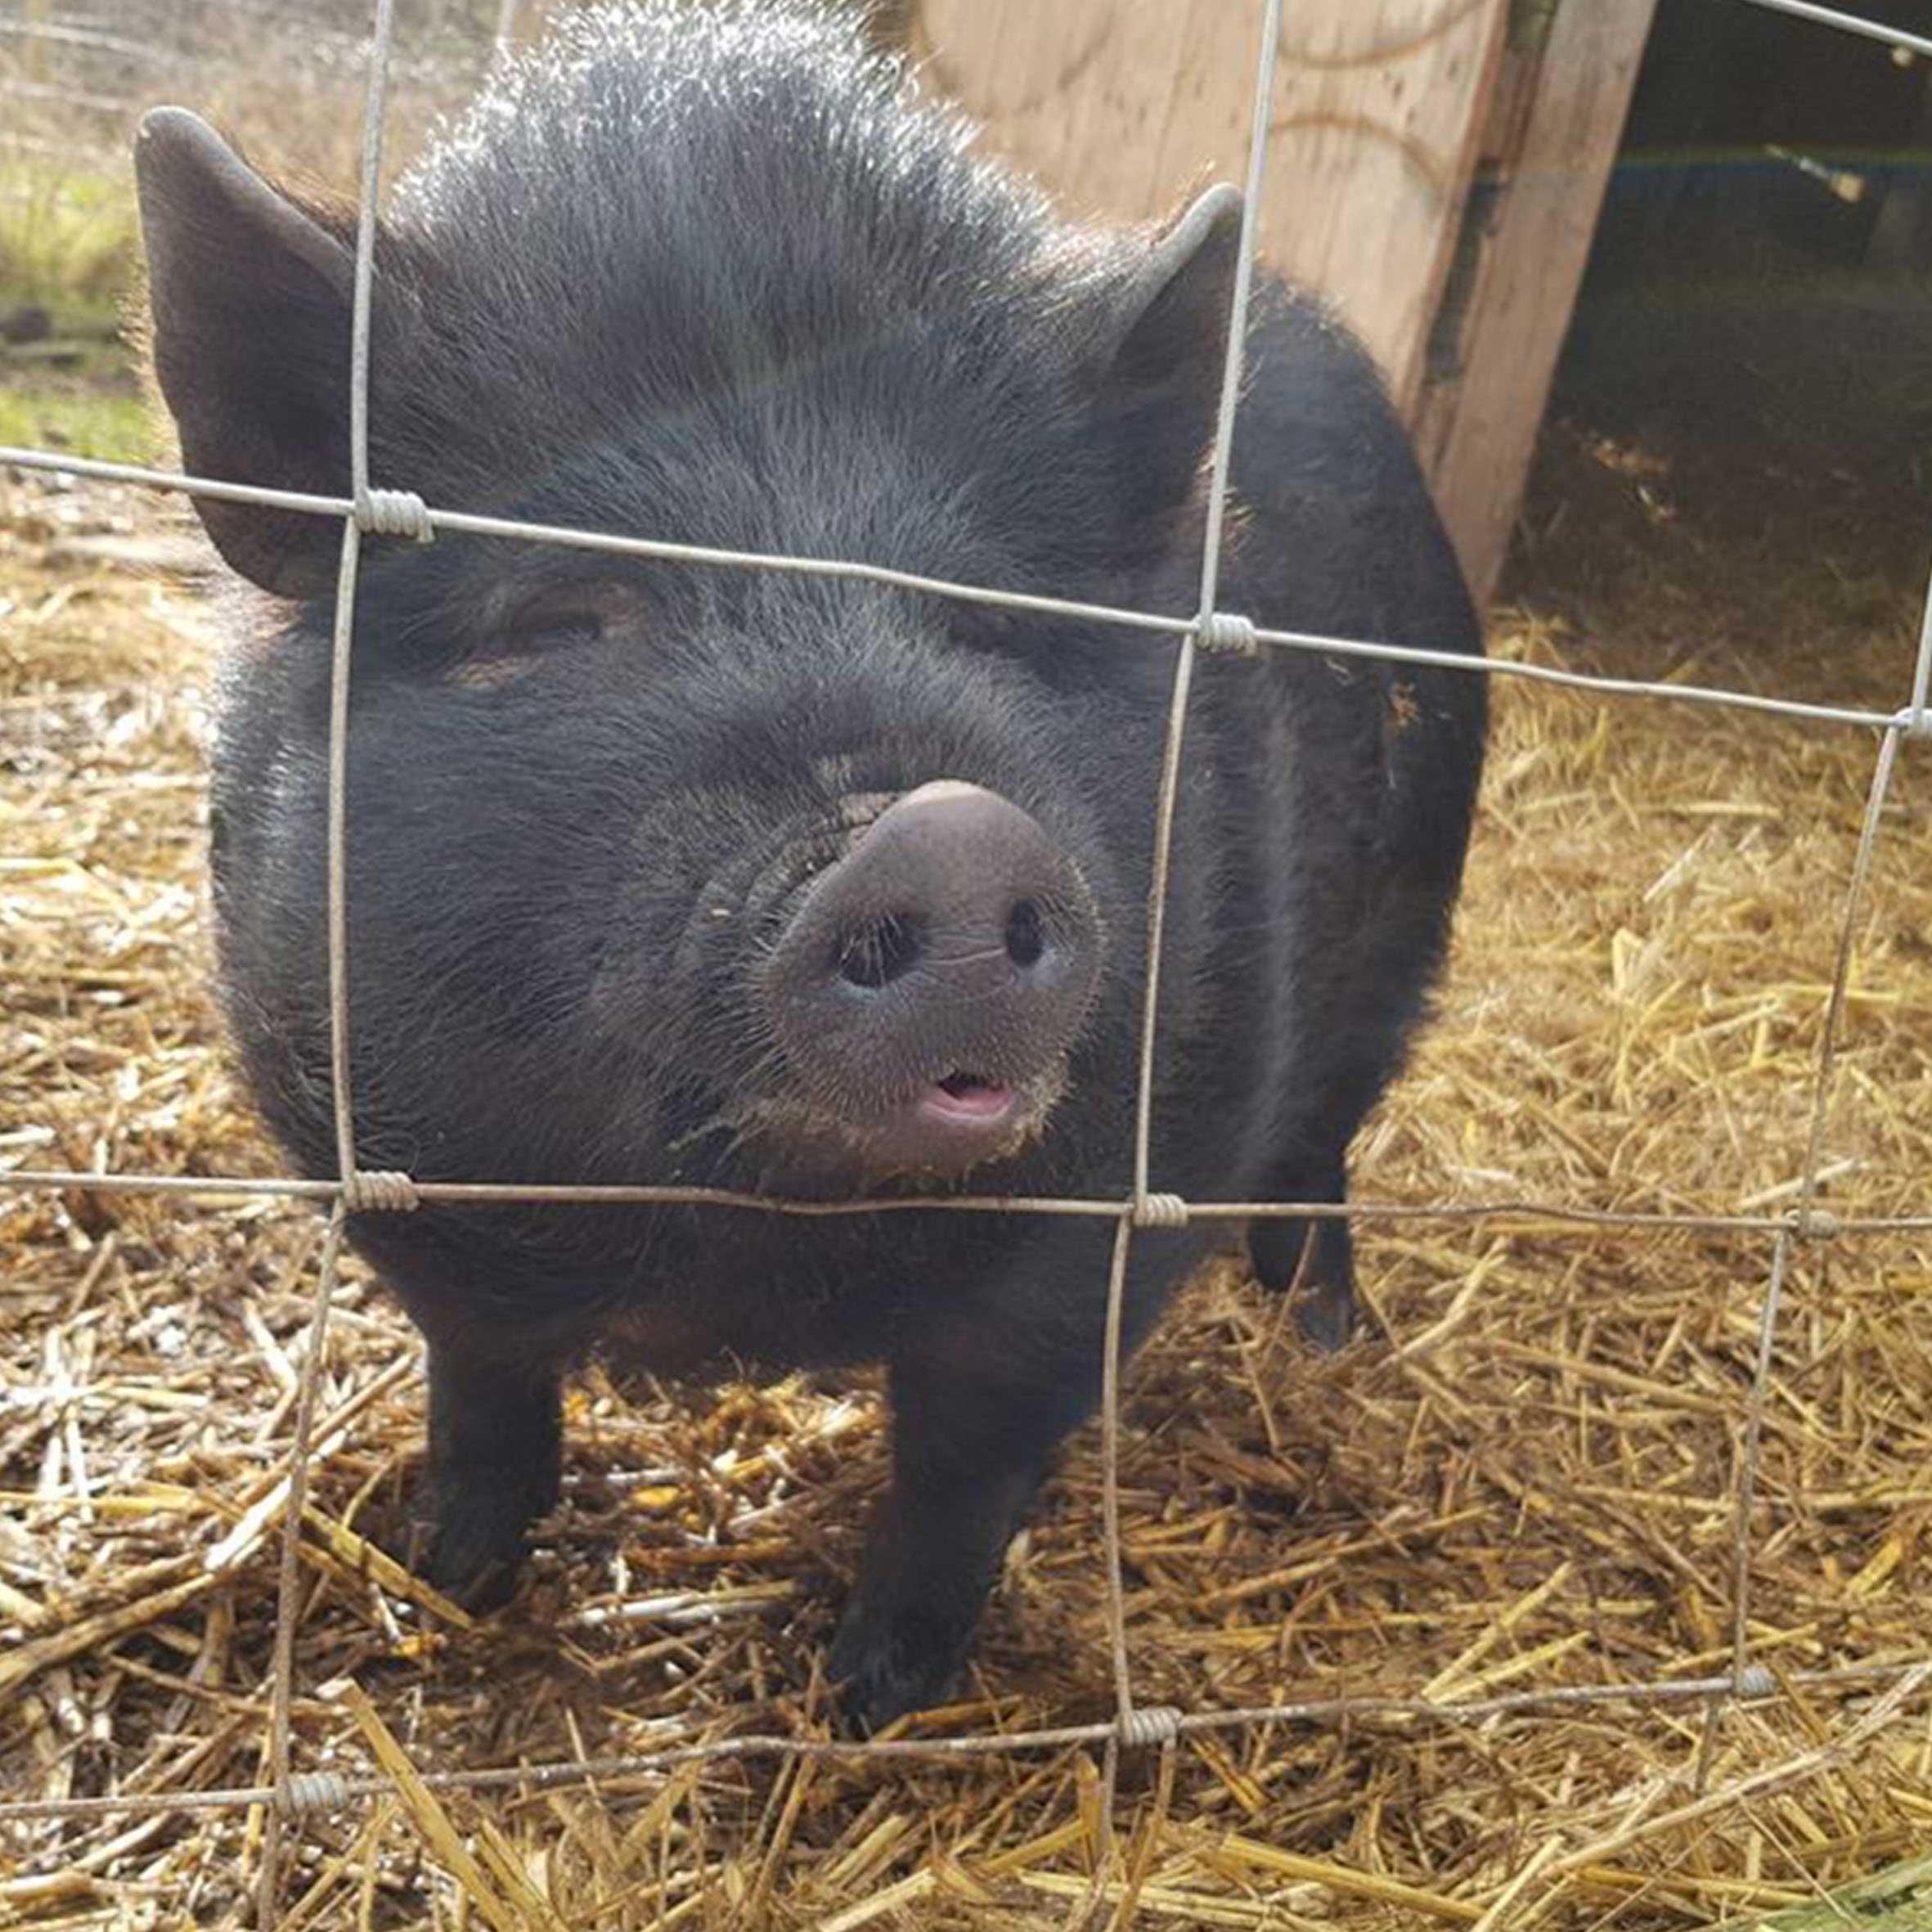 TOBY the Pig at FARS